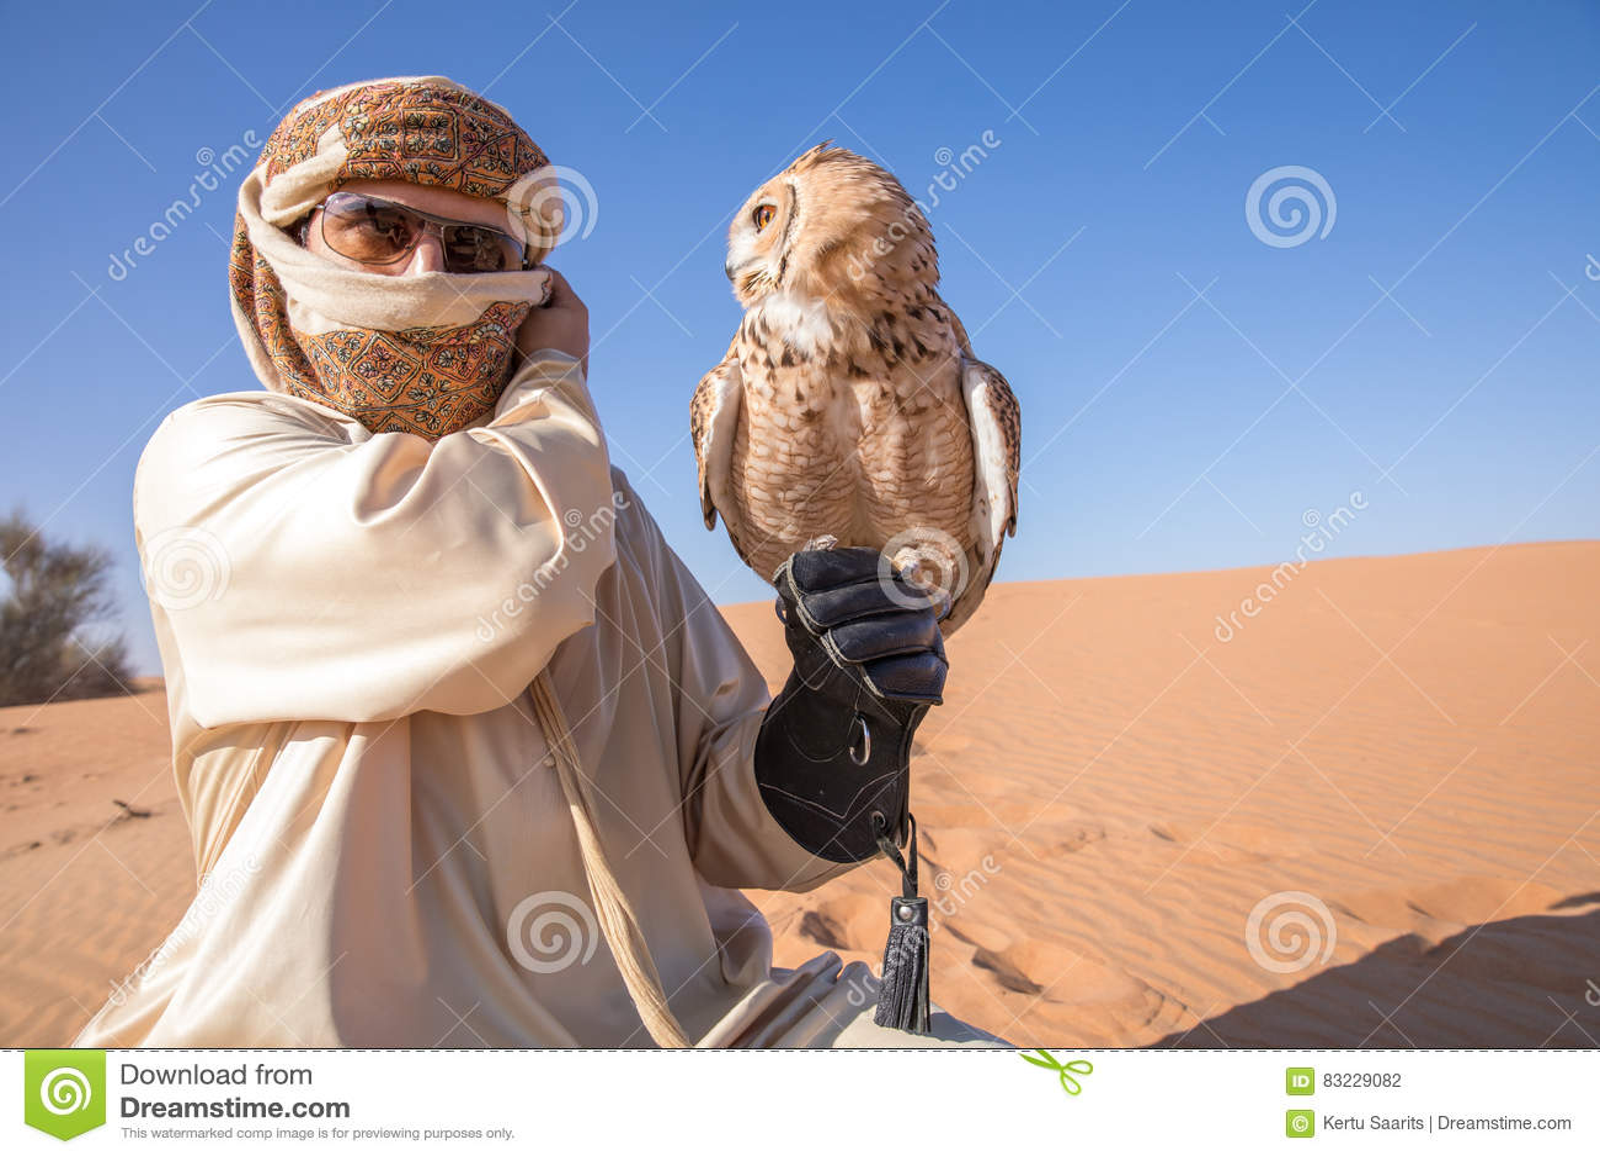 Ung manlig faraoörnuggla under en ökenfalkenerarkonstshow i Dubai, UAE